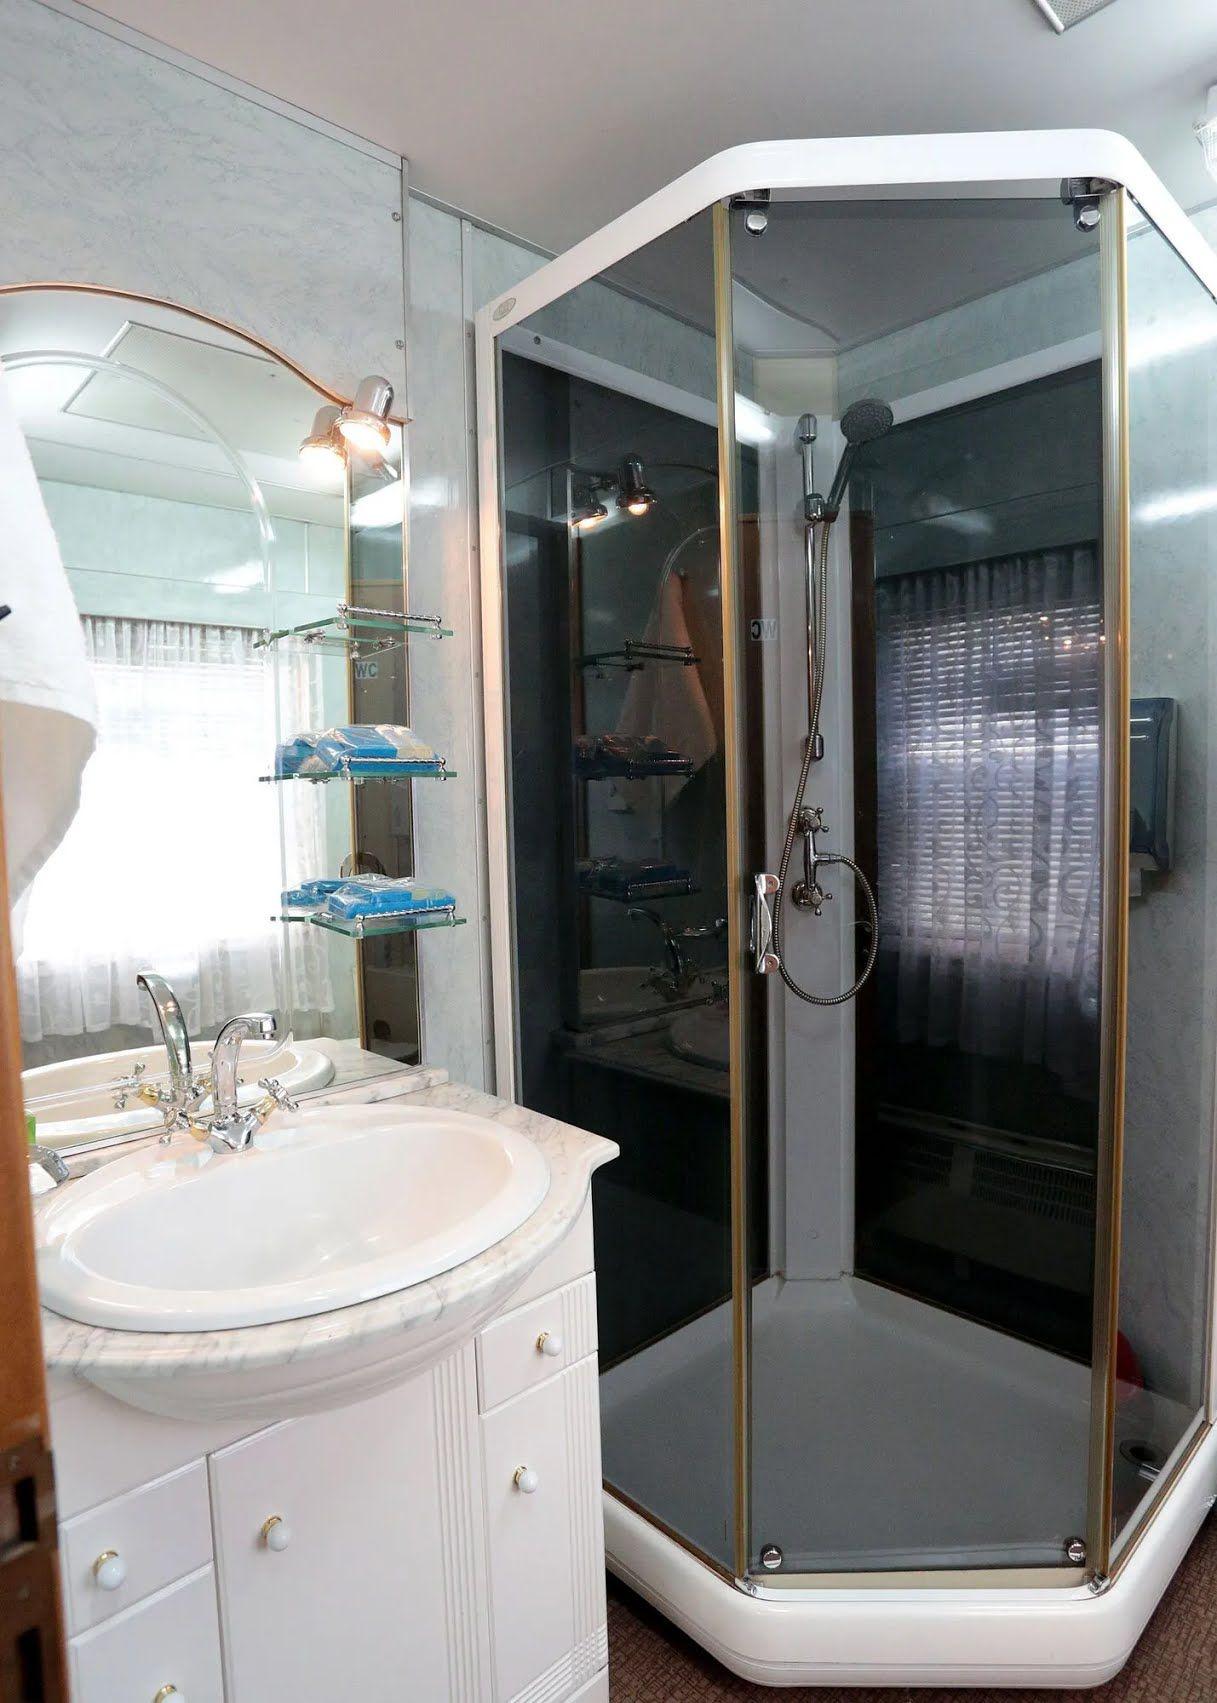 Так выглядит ванная комната